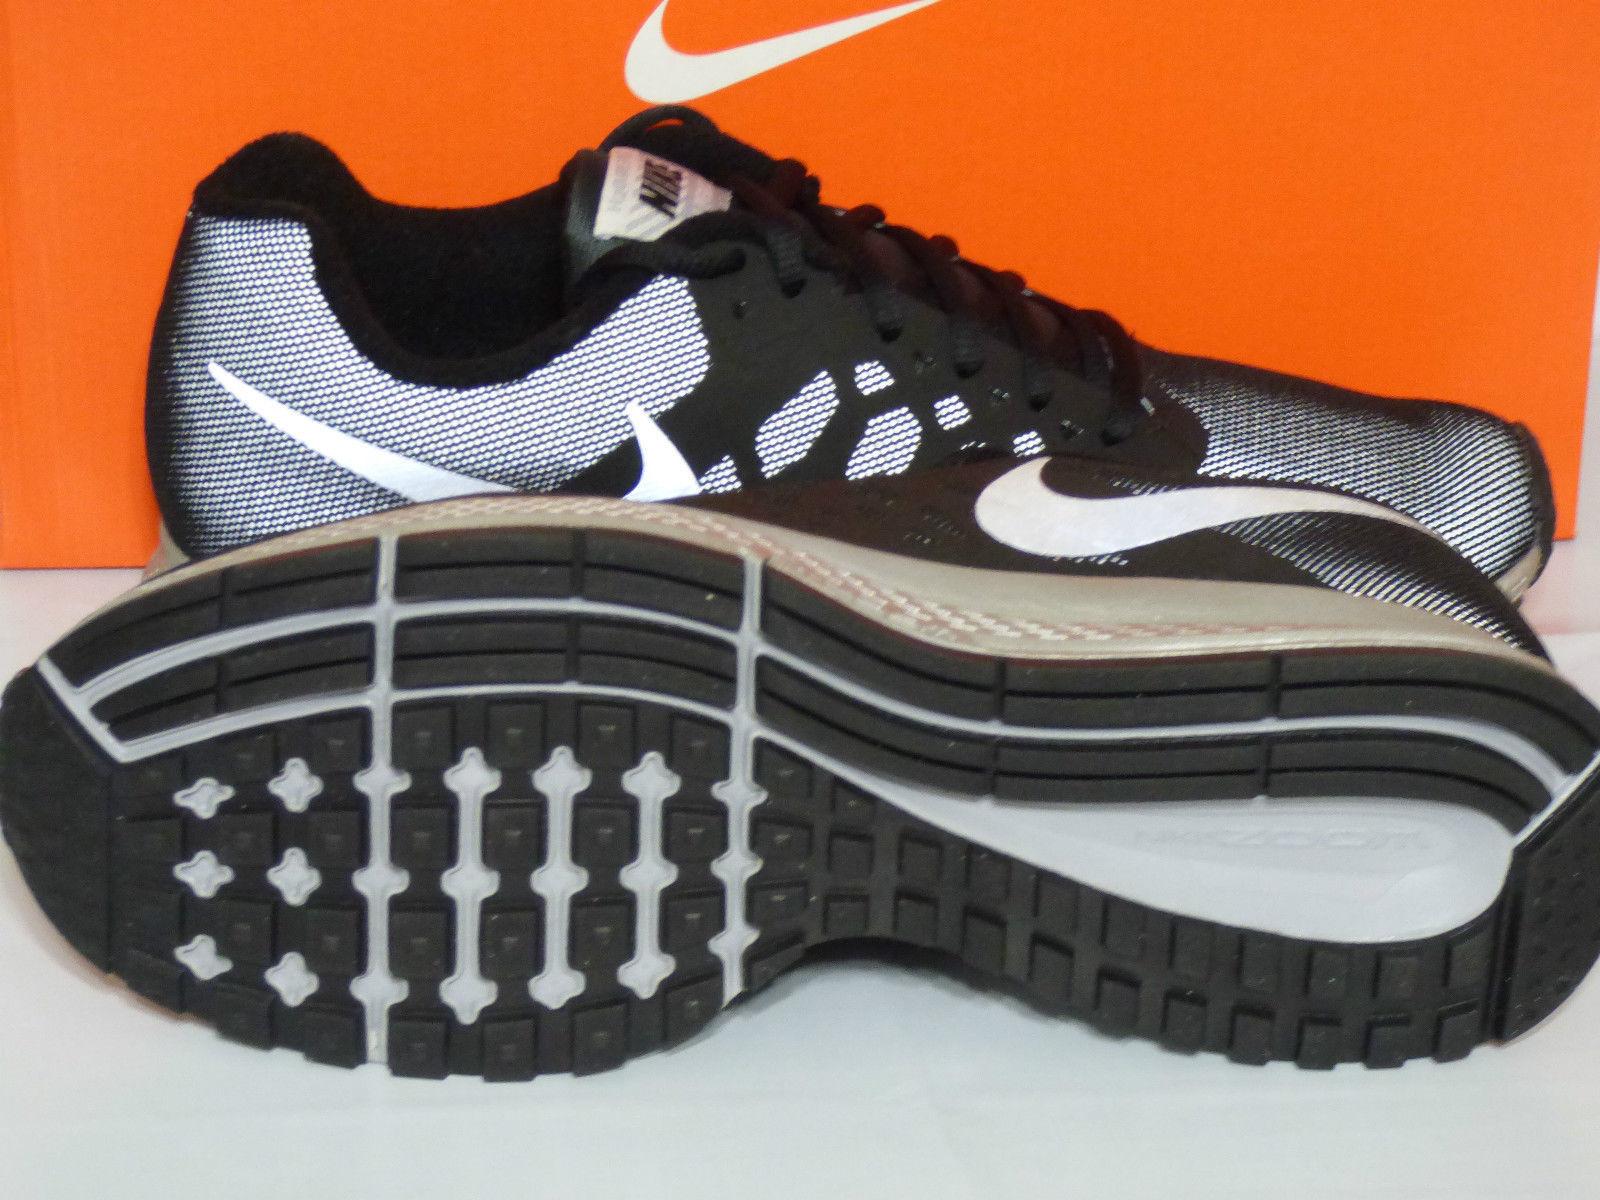 b18824e1266ef Nike Zoom Pegasus 31 Flash Men s Running and 50 similar items